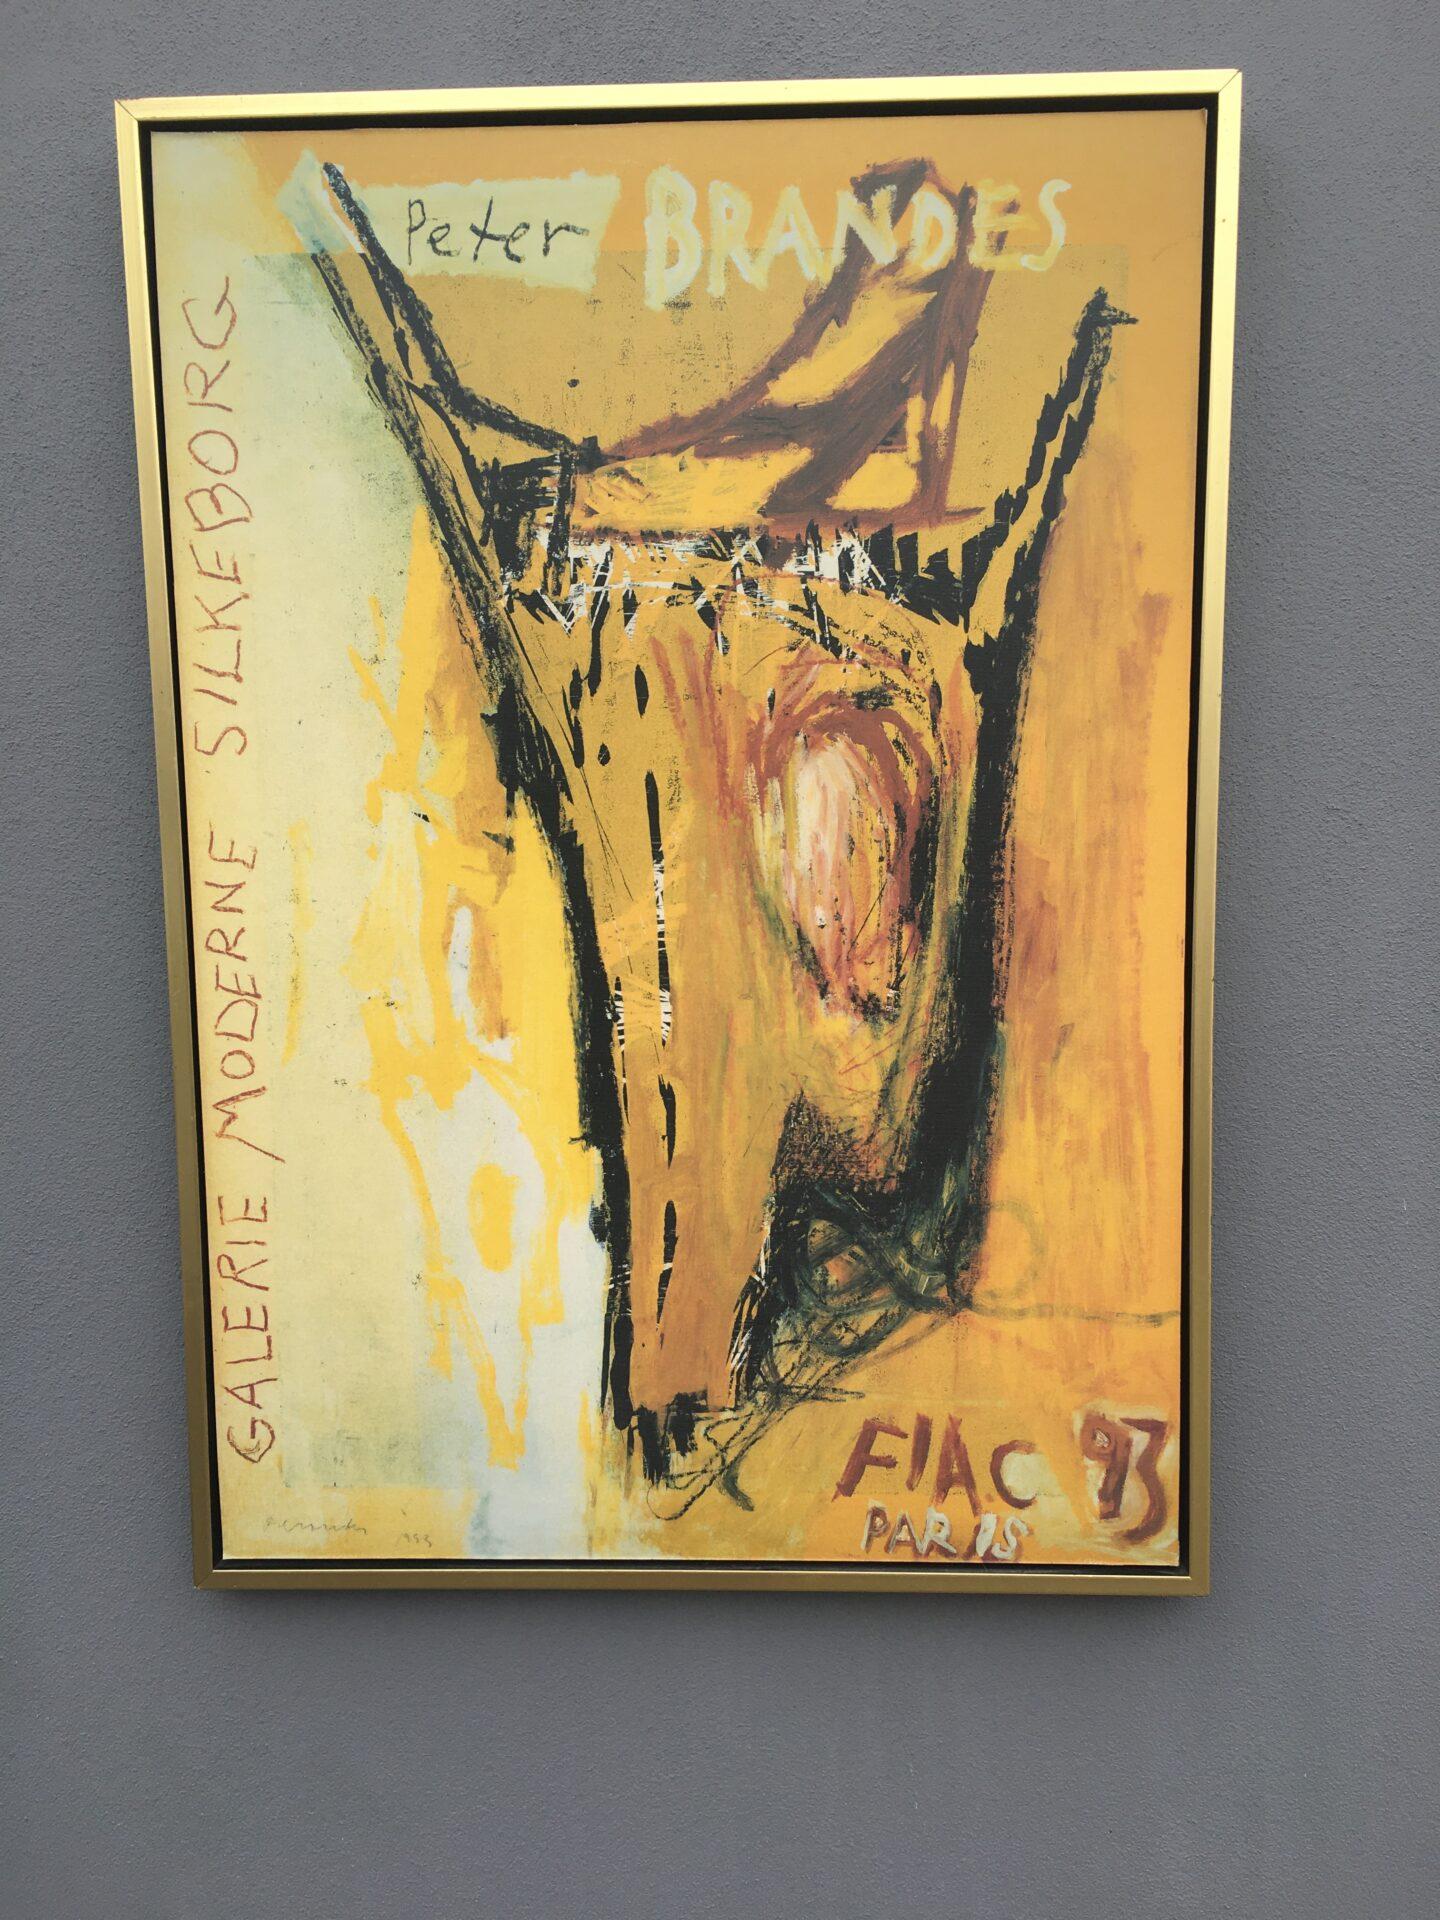 Peter Brandes Kunsttryk, rammemål,70x100 cm, pris 300kr